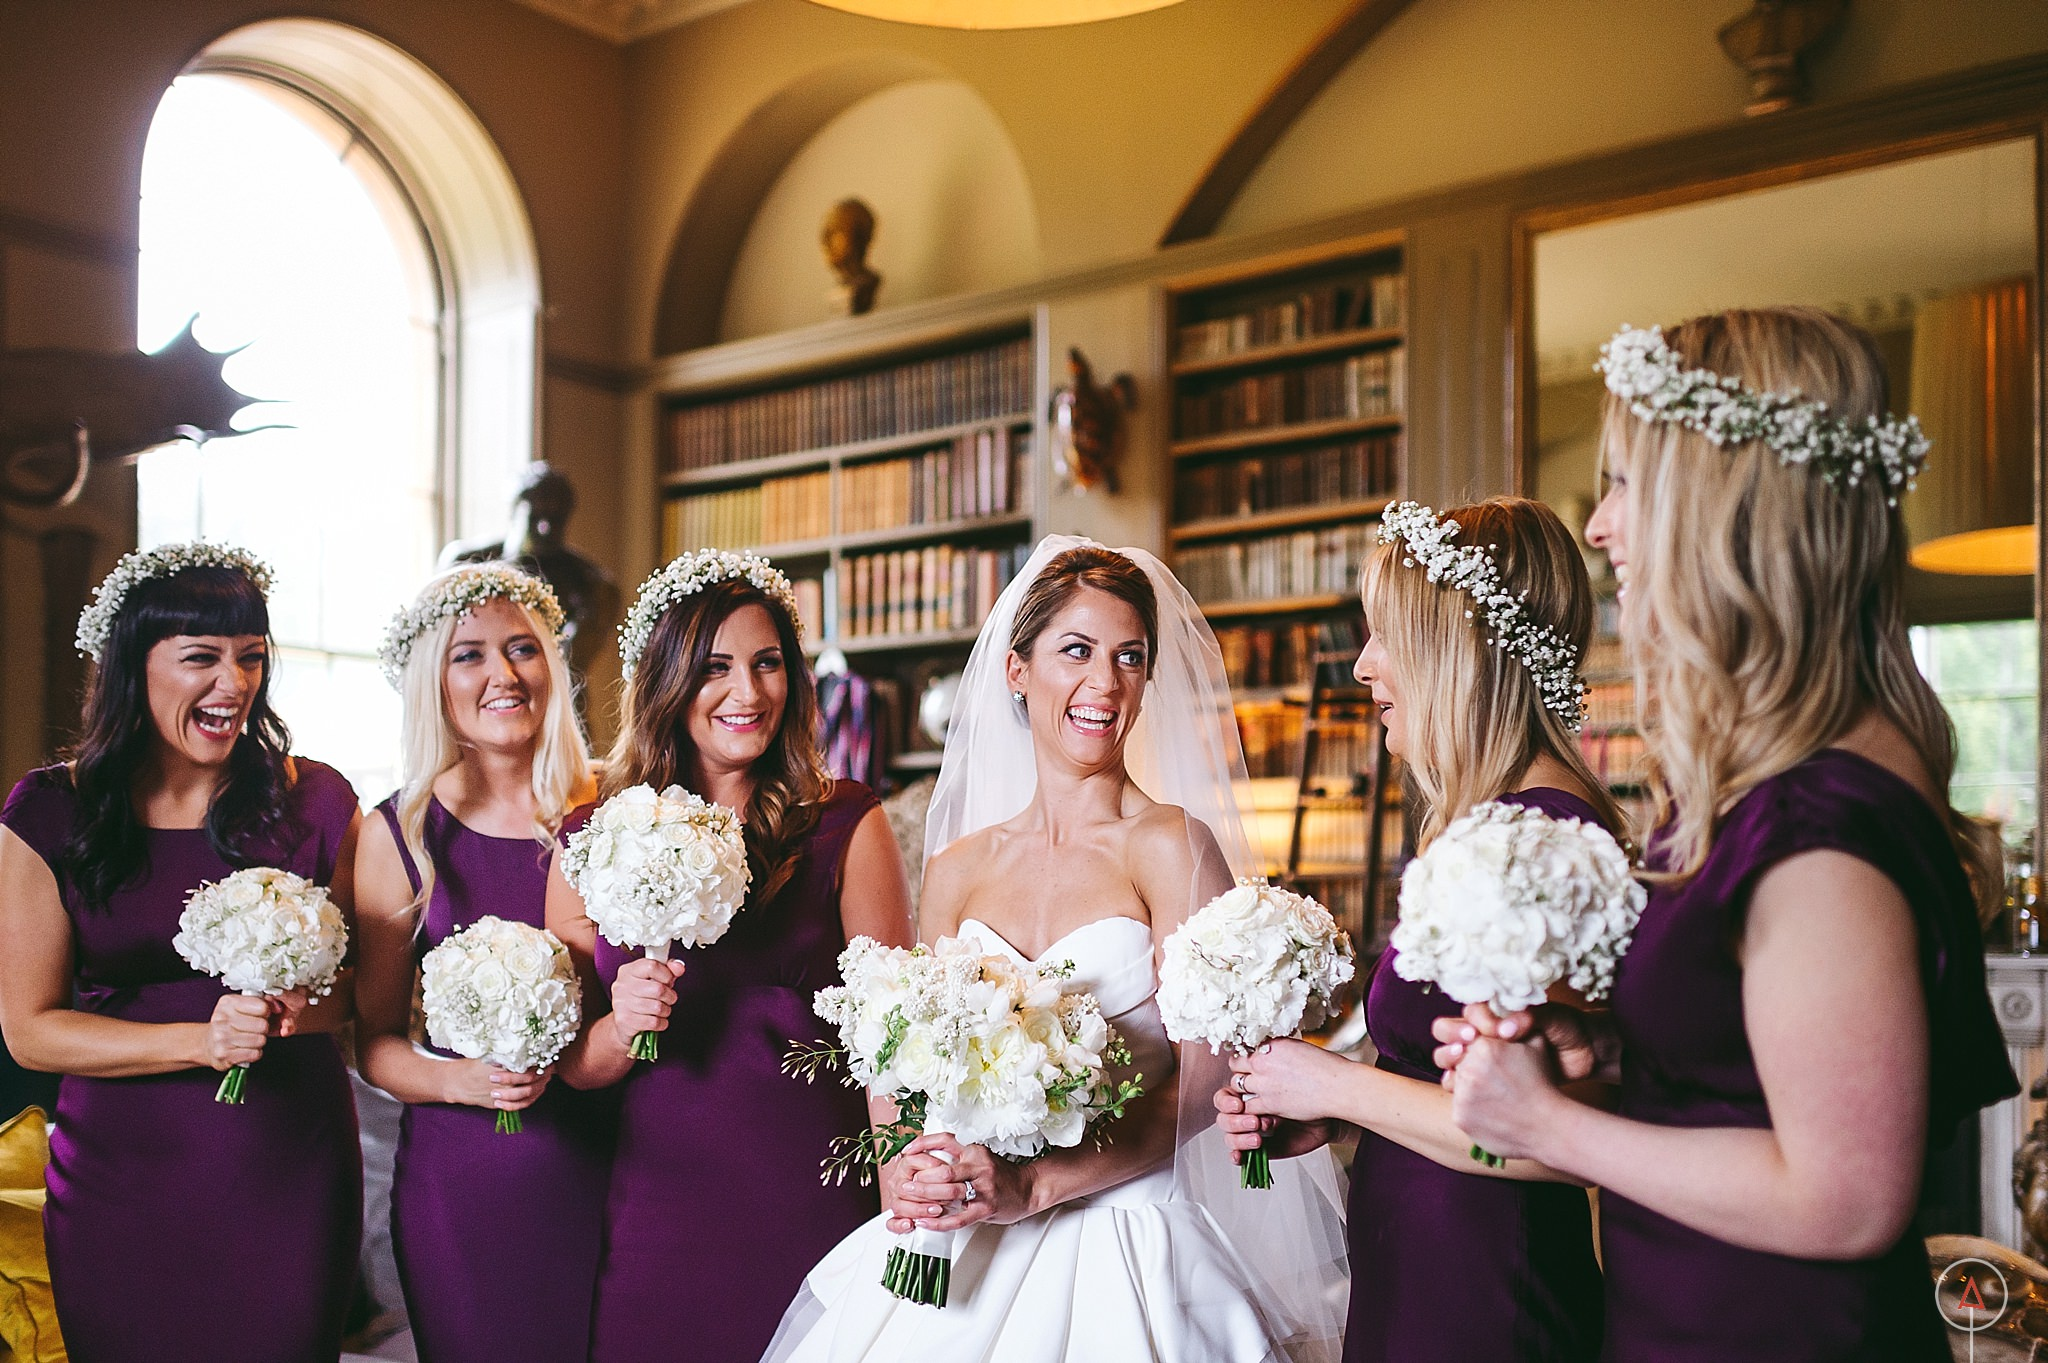 cardiff-wedding-photographer-aga-tomaszek_0278